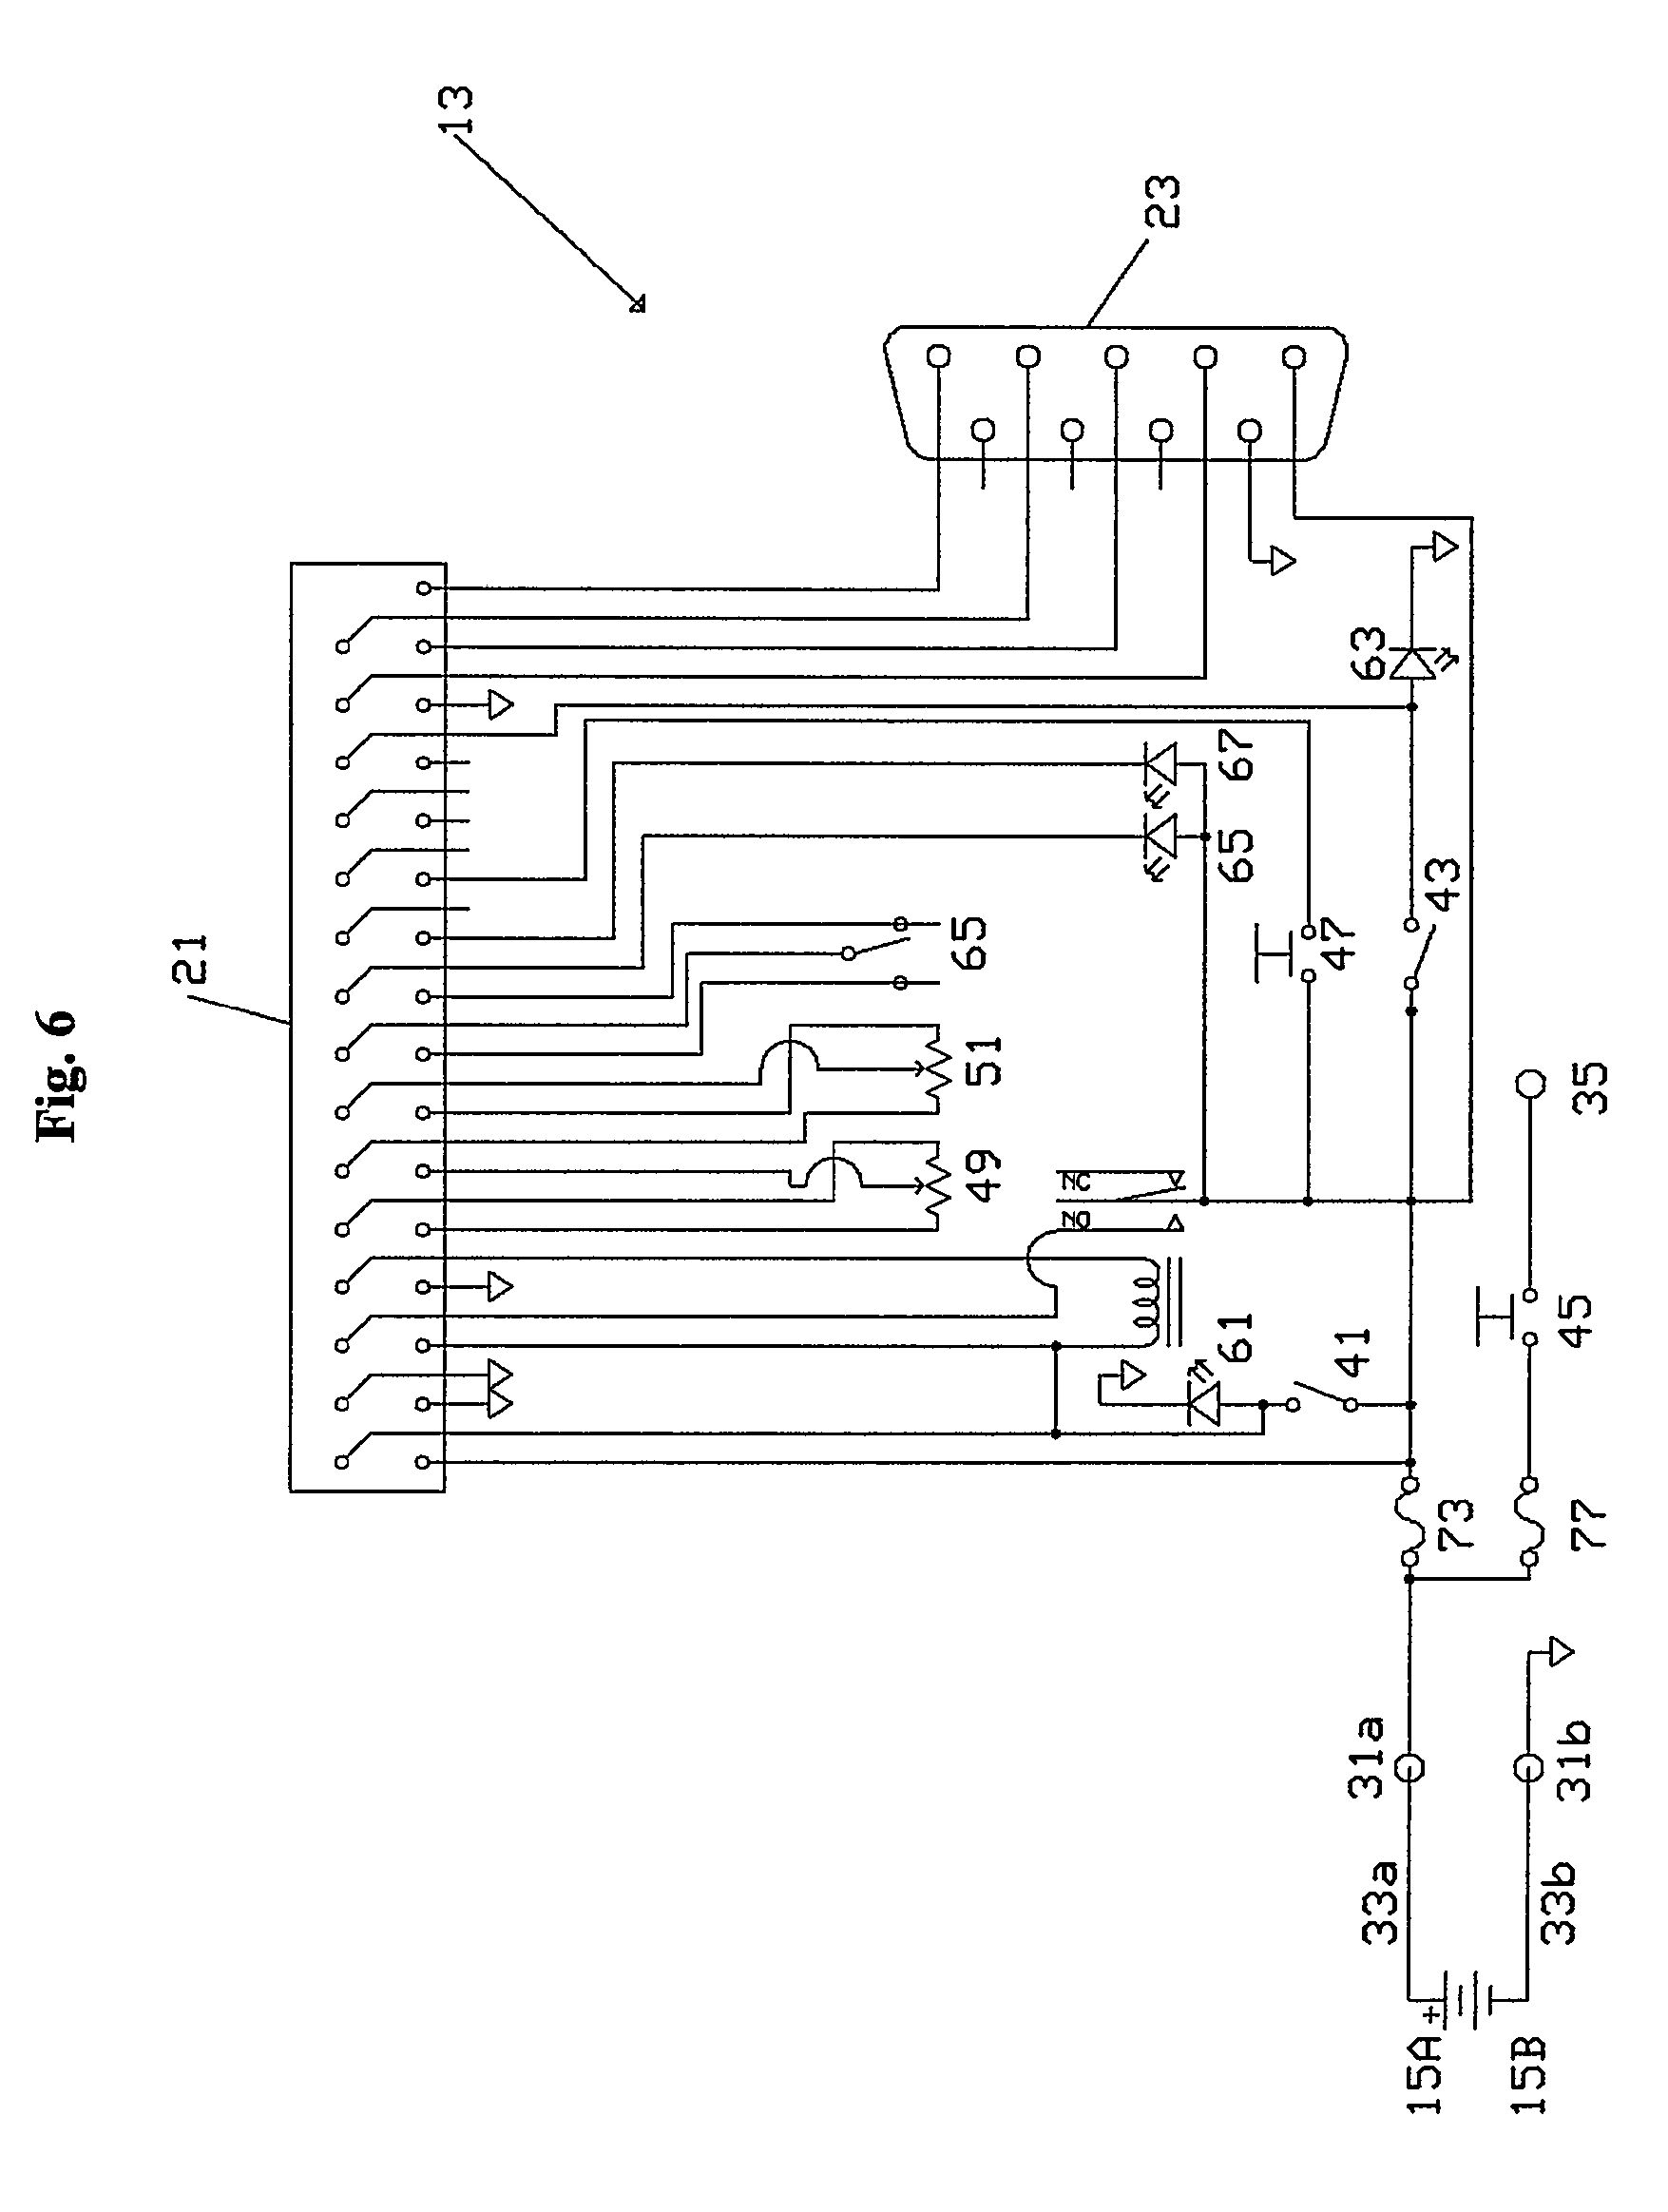 detroit ddec 2 ecm wiring diagram   33 wiring diagram